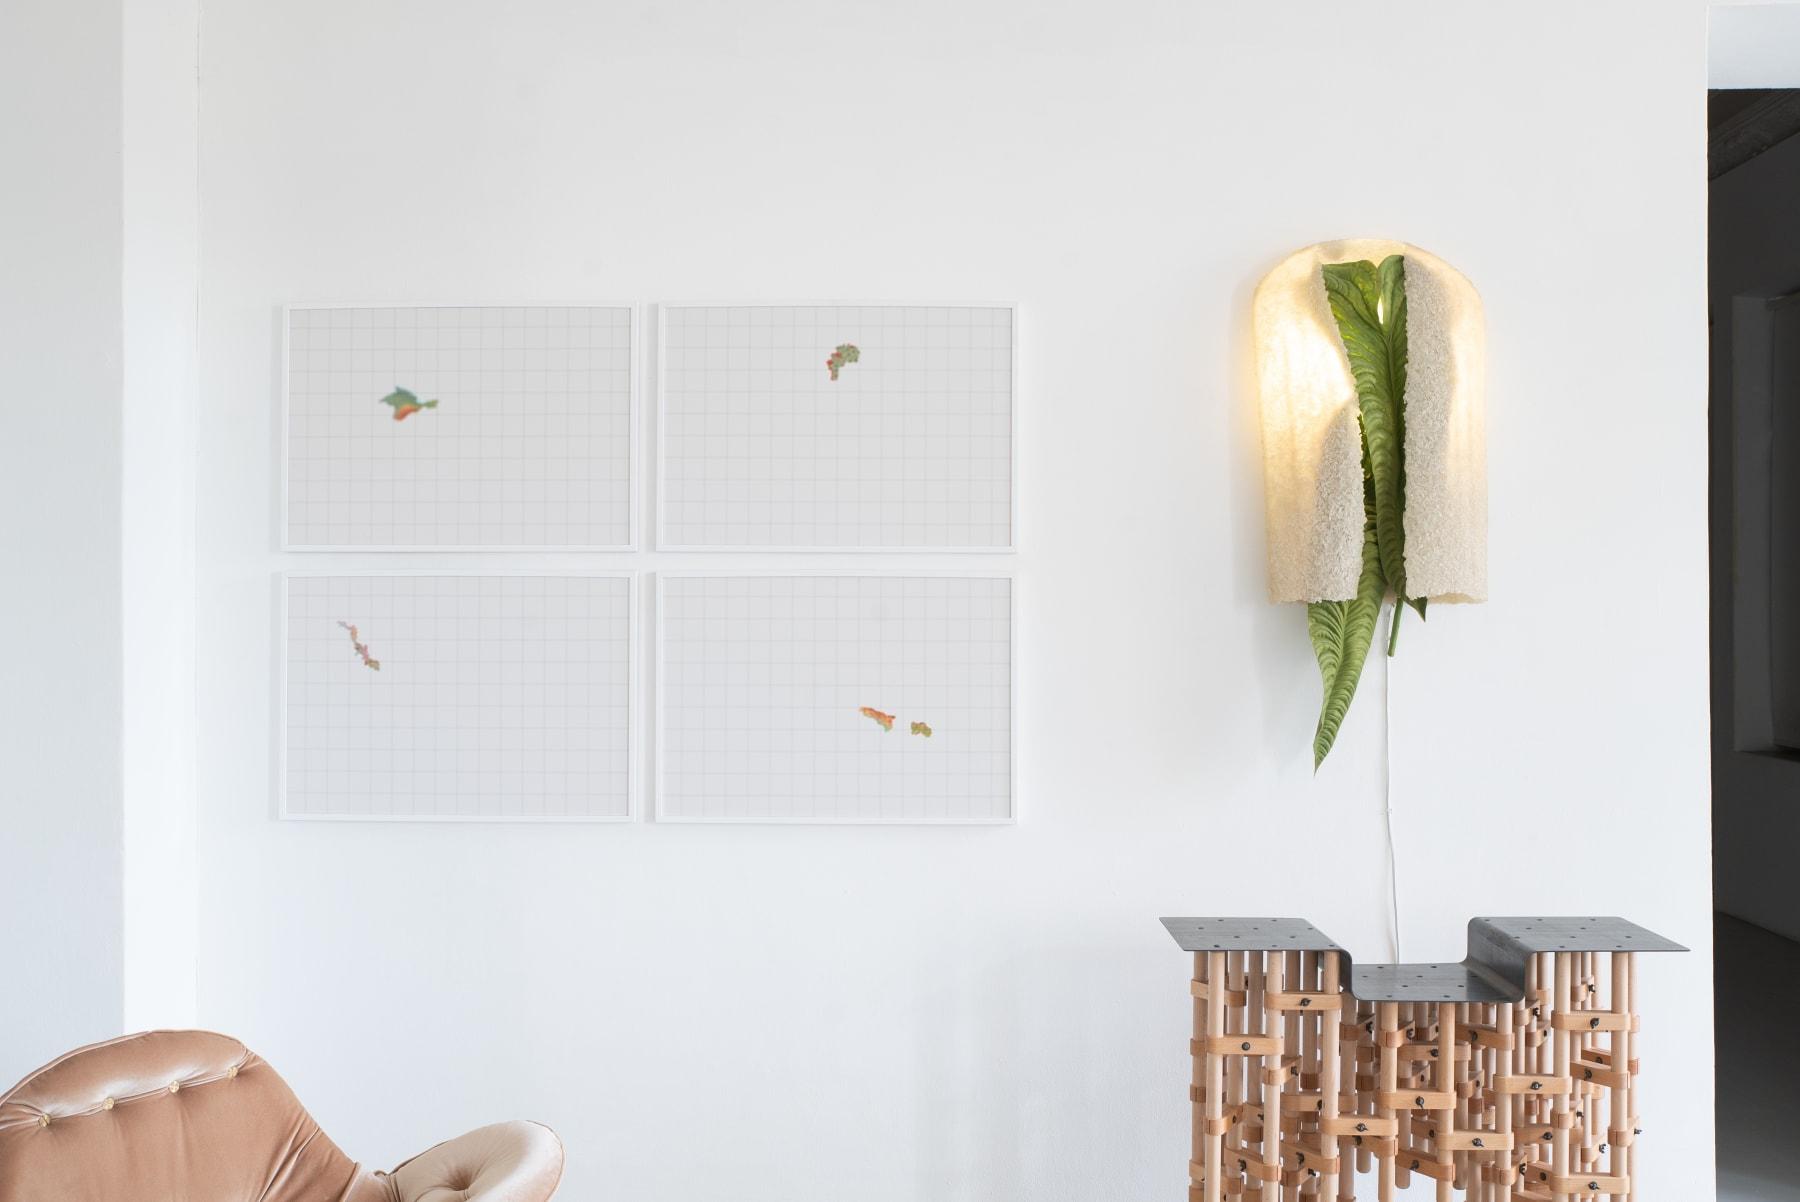 Galerija Vartai, 2020 Wall object